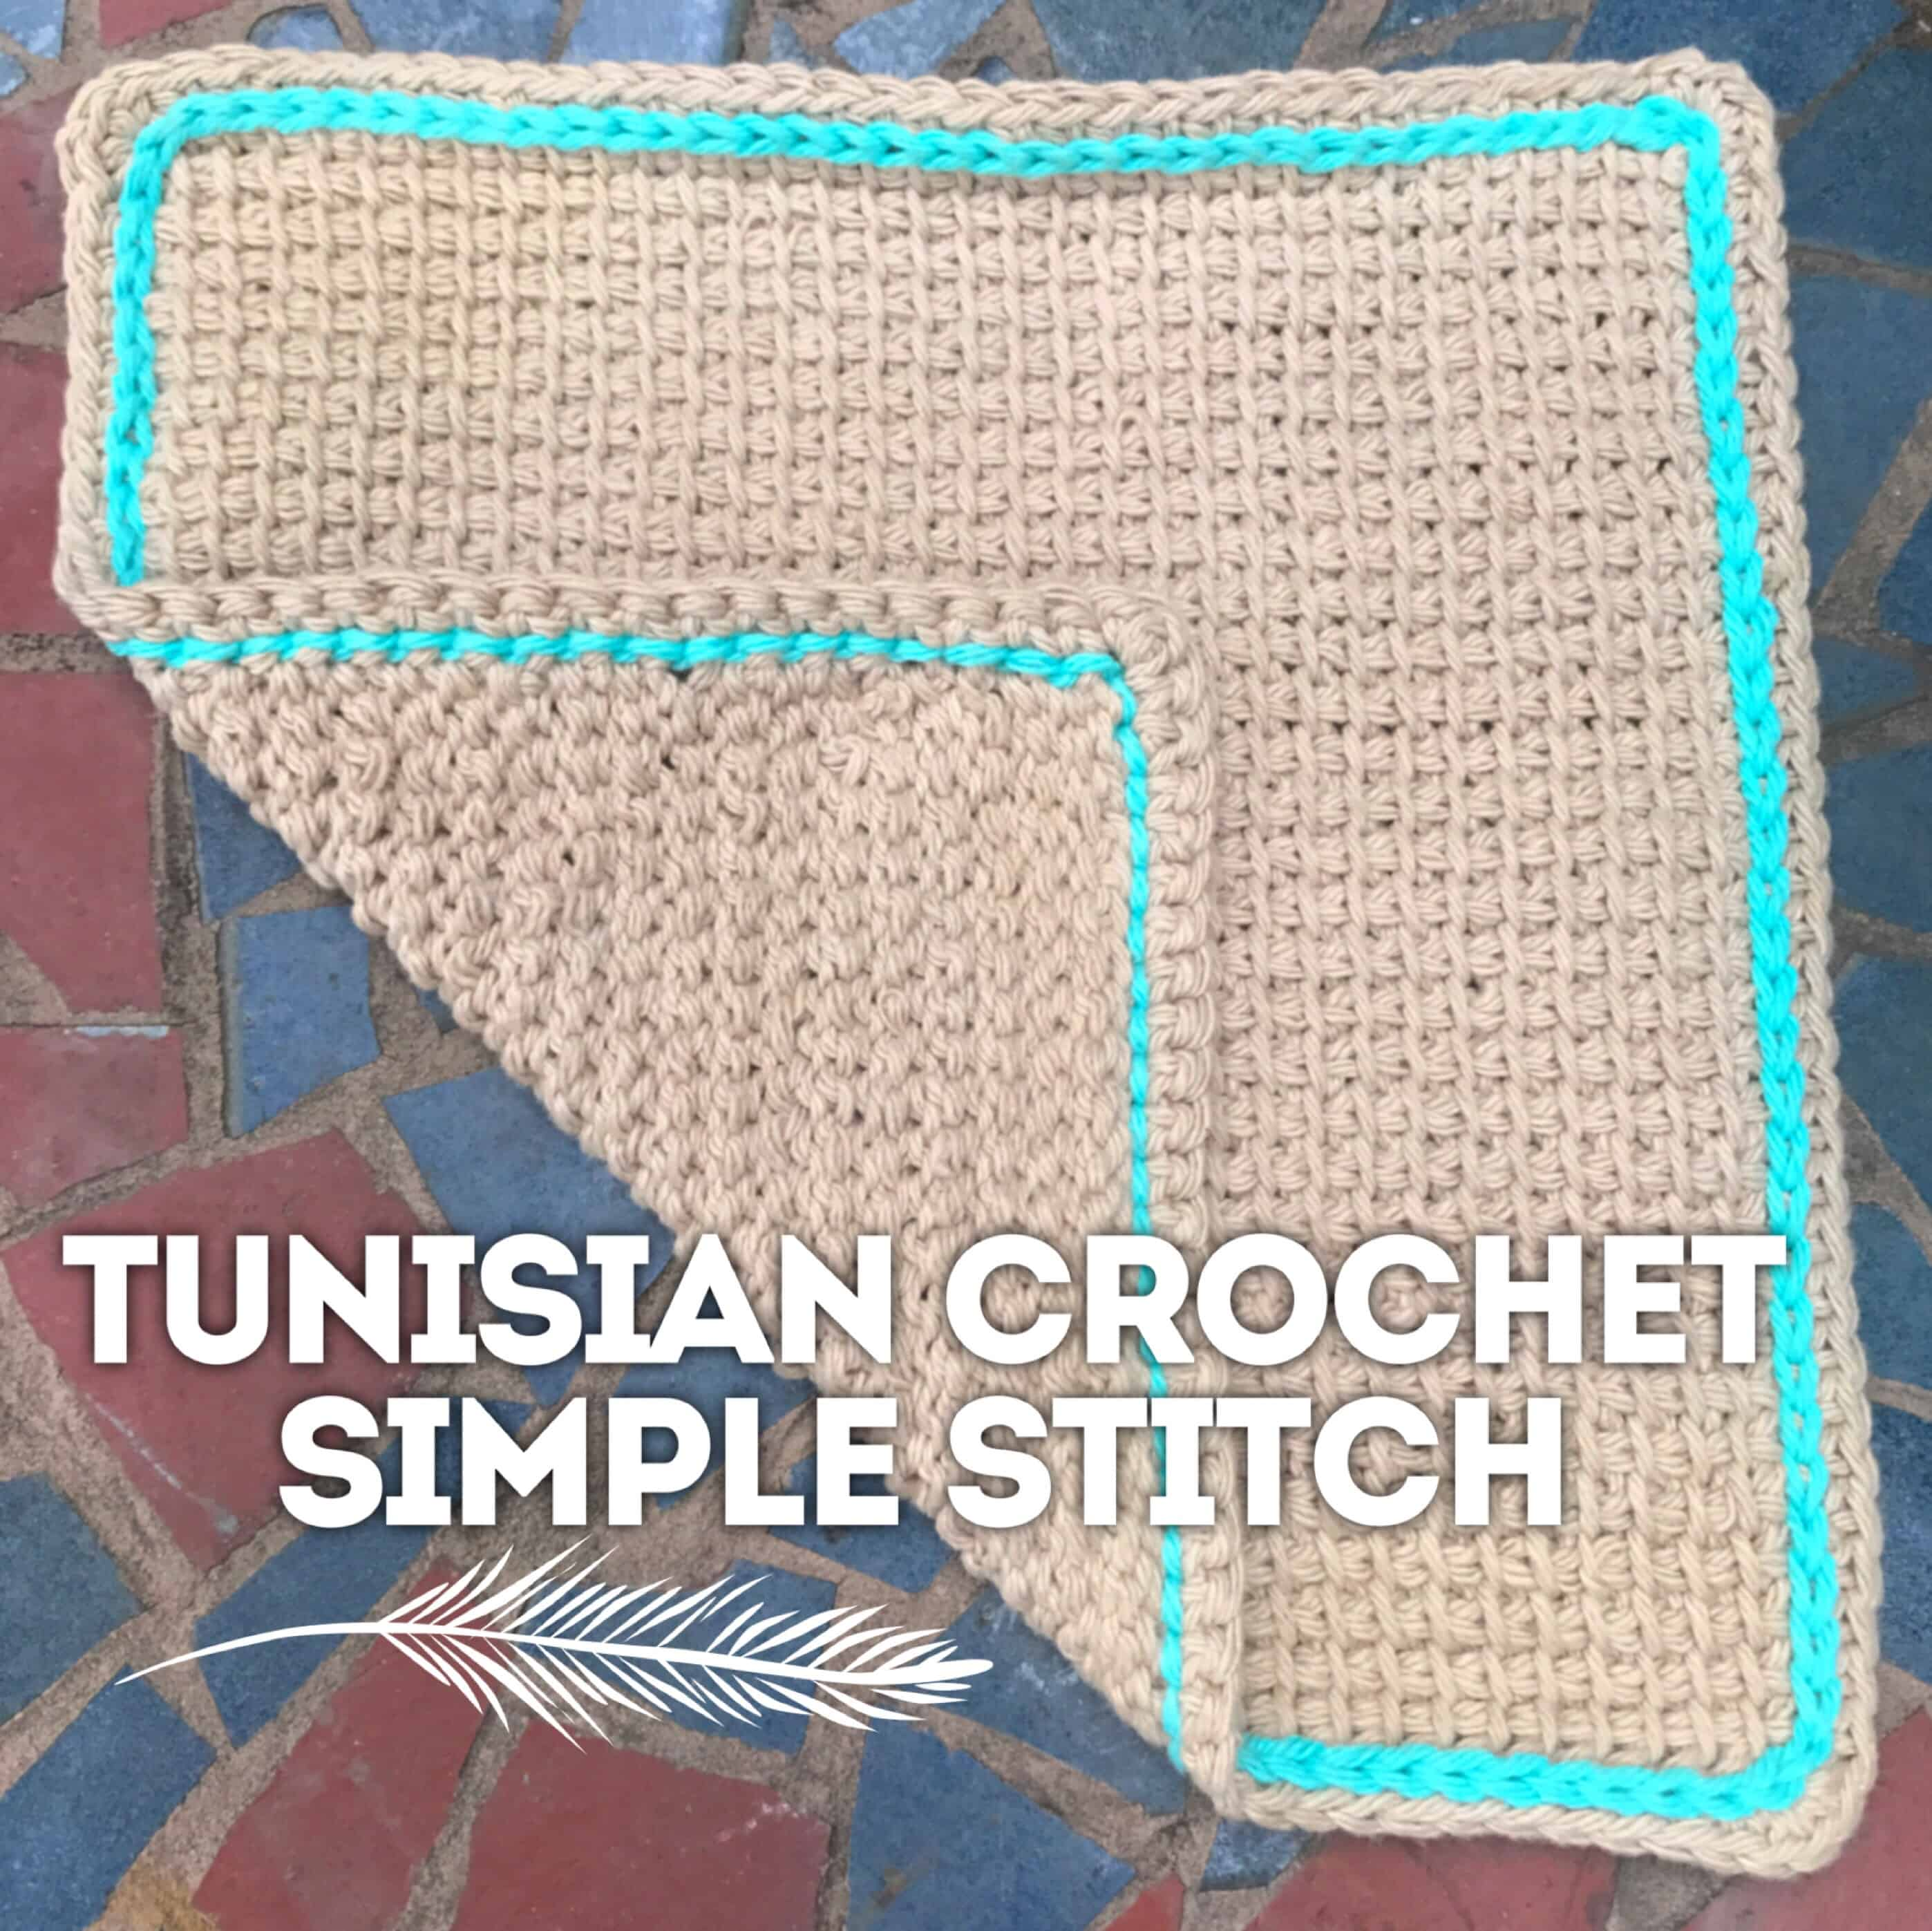 Tunisian crochet simple stitch washcloth in tan with aqua colored simple stitch border